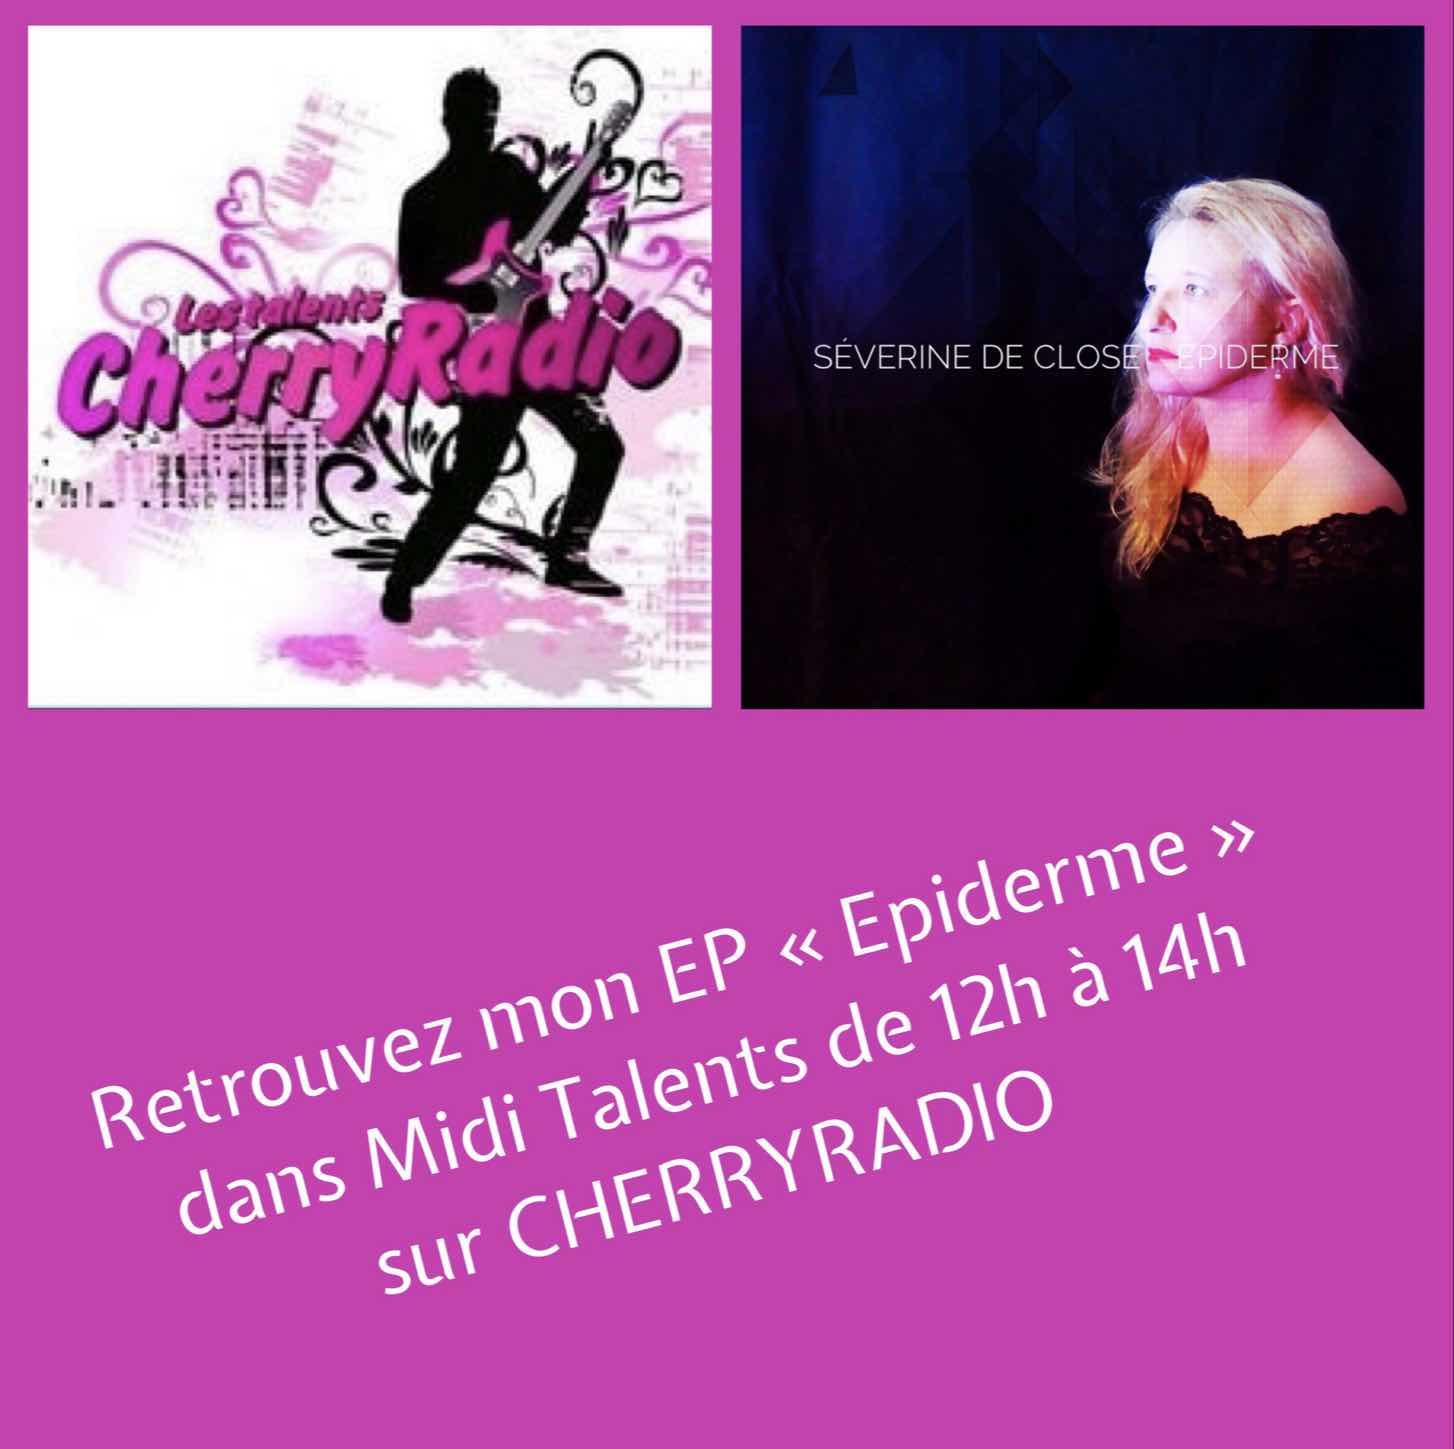 Epiderme sur Cherry Radio